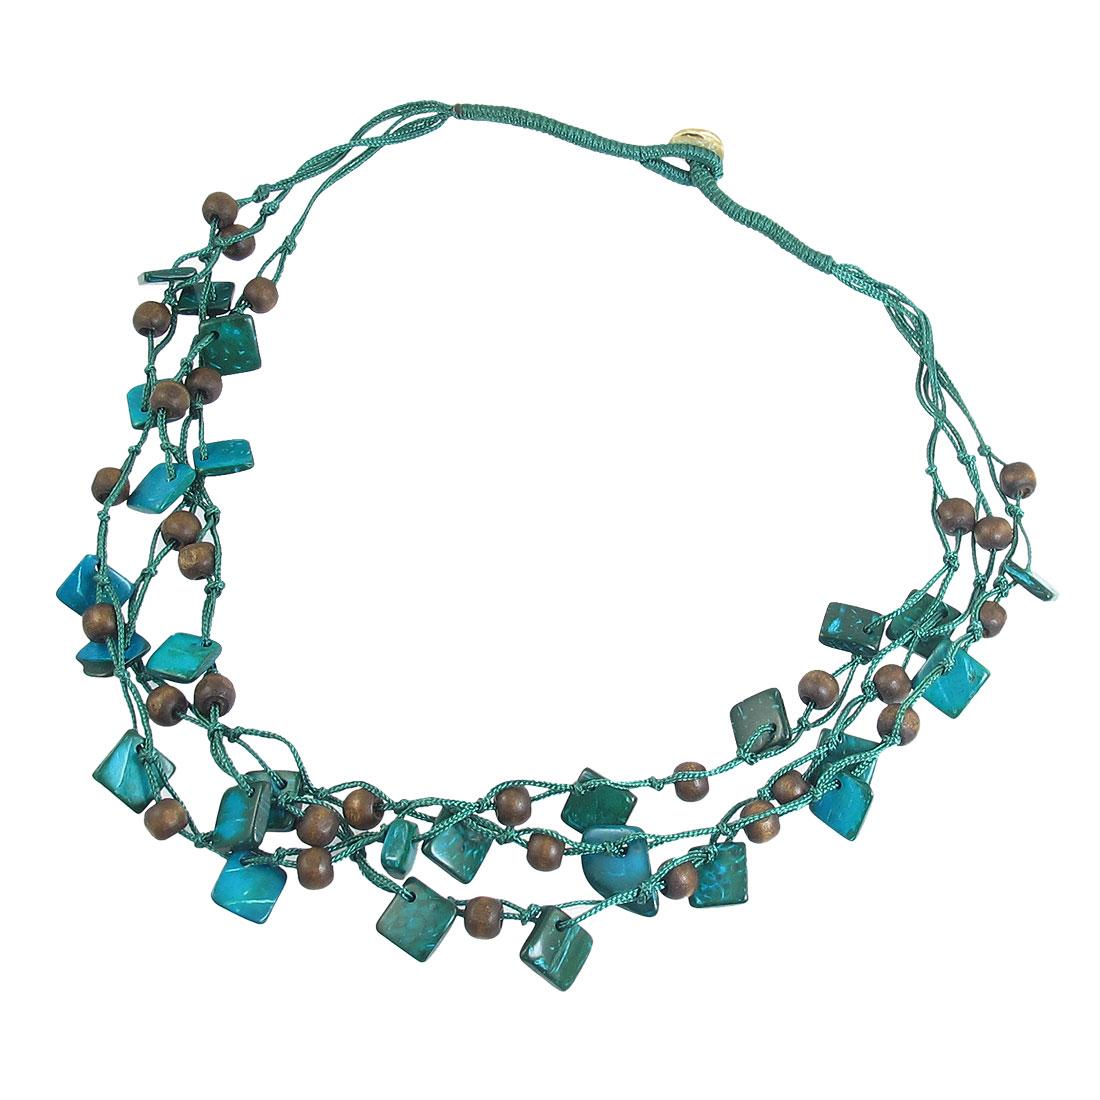 Blue Brown Nylon Cord Braid 3 Layer Pendant Square Coco Beaded Necklace Chain